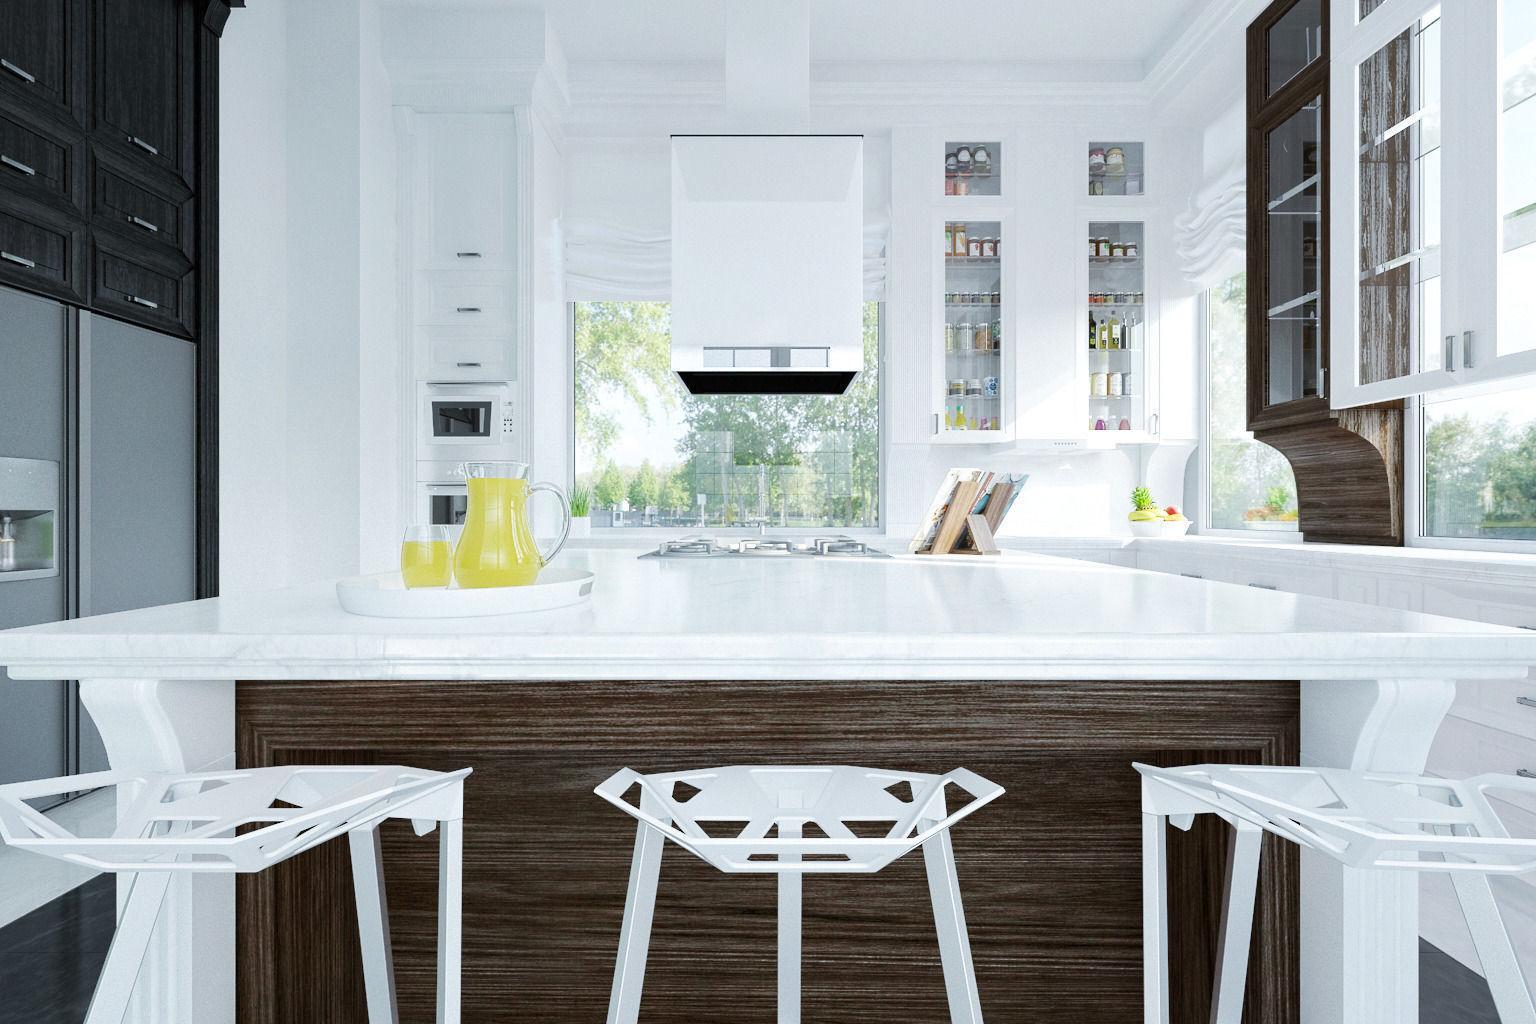 Royal Kitchen Design Interior 3d Model Max 1 ...